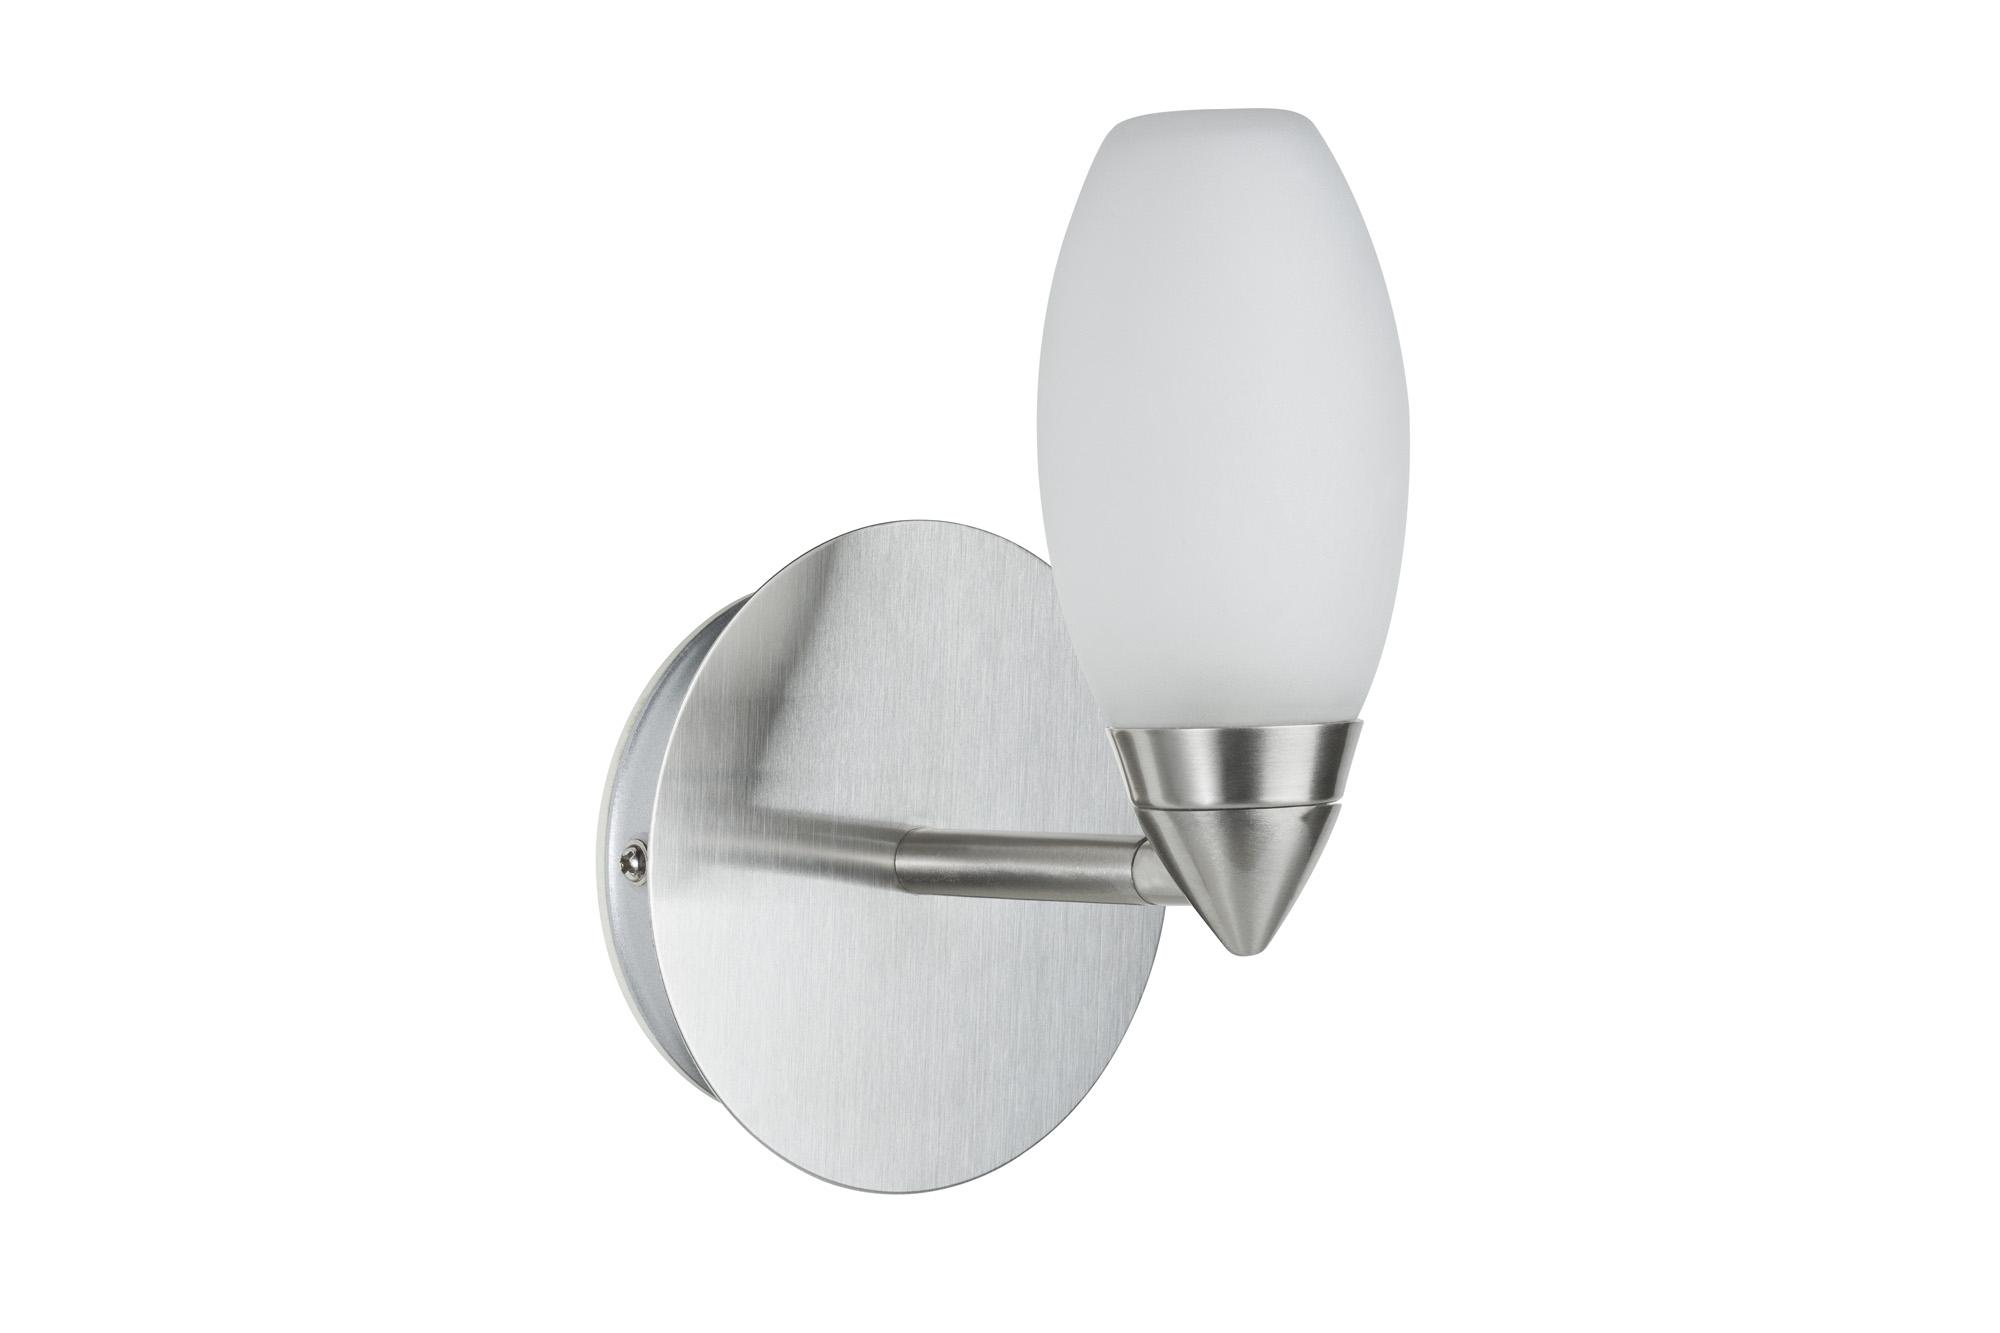 Applique salle de bain paulmann carina ip44 1x28w 230v g9 for Applique salle de bain ip44